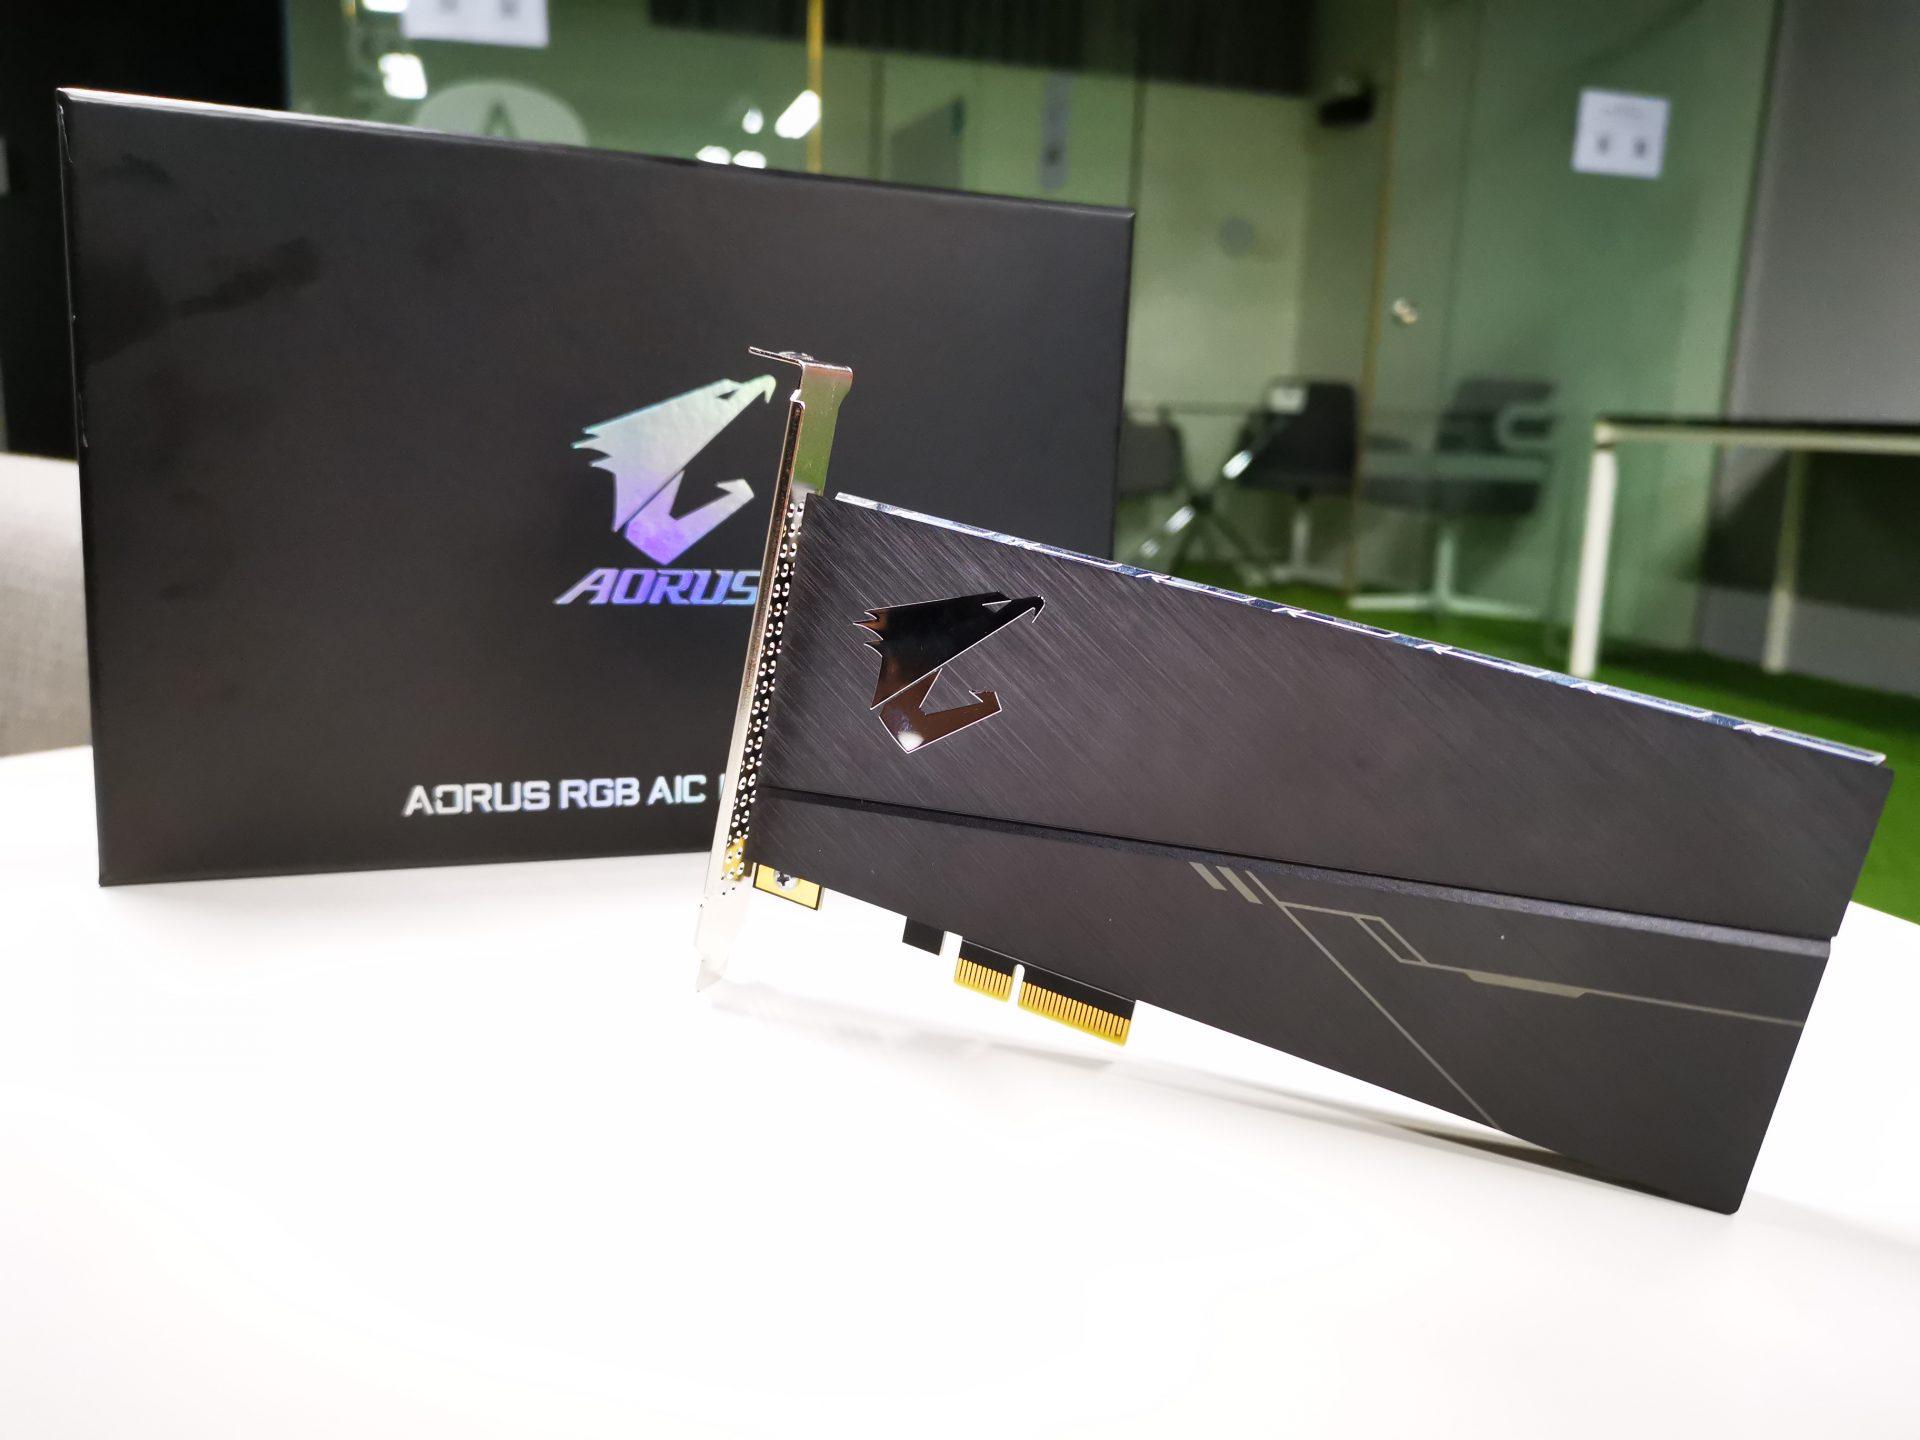 Gigabyte AORUS RGB AIC NVMe SSD Review - The Tech Revolutionist